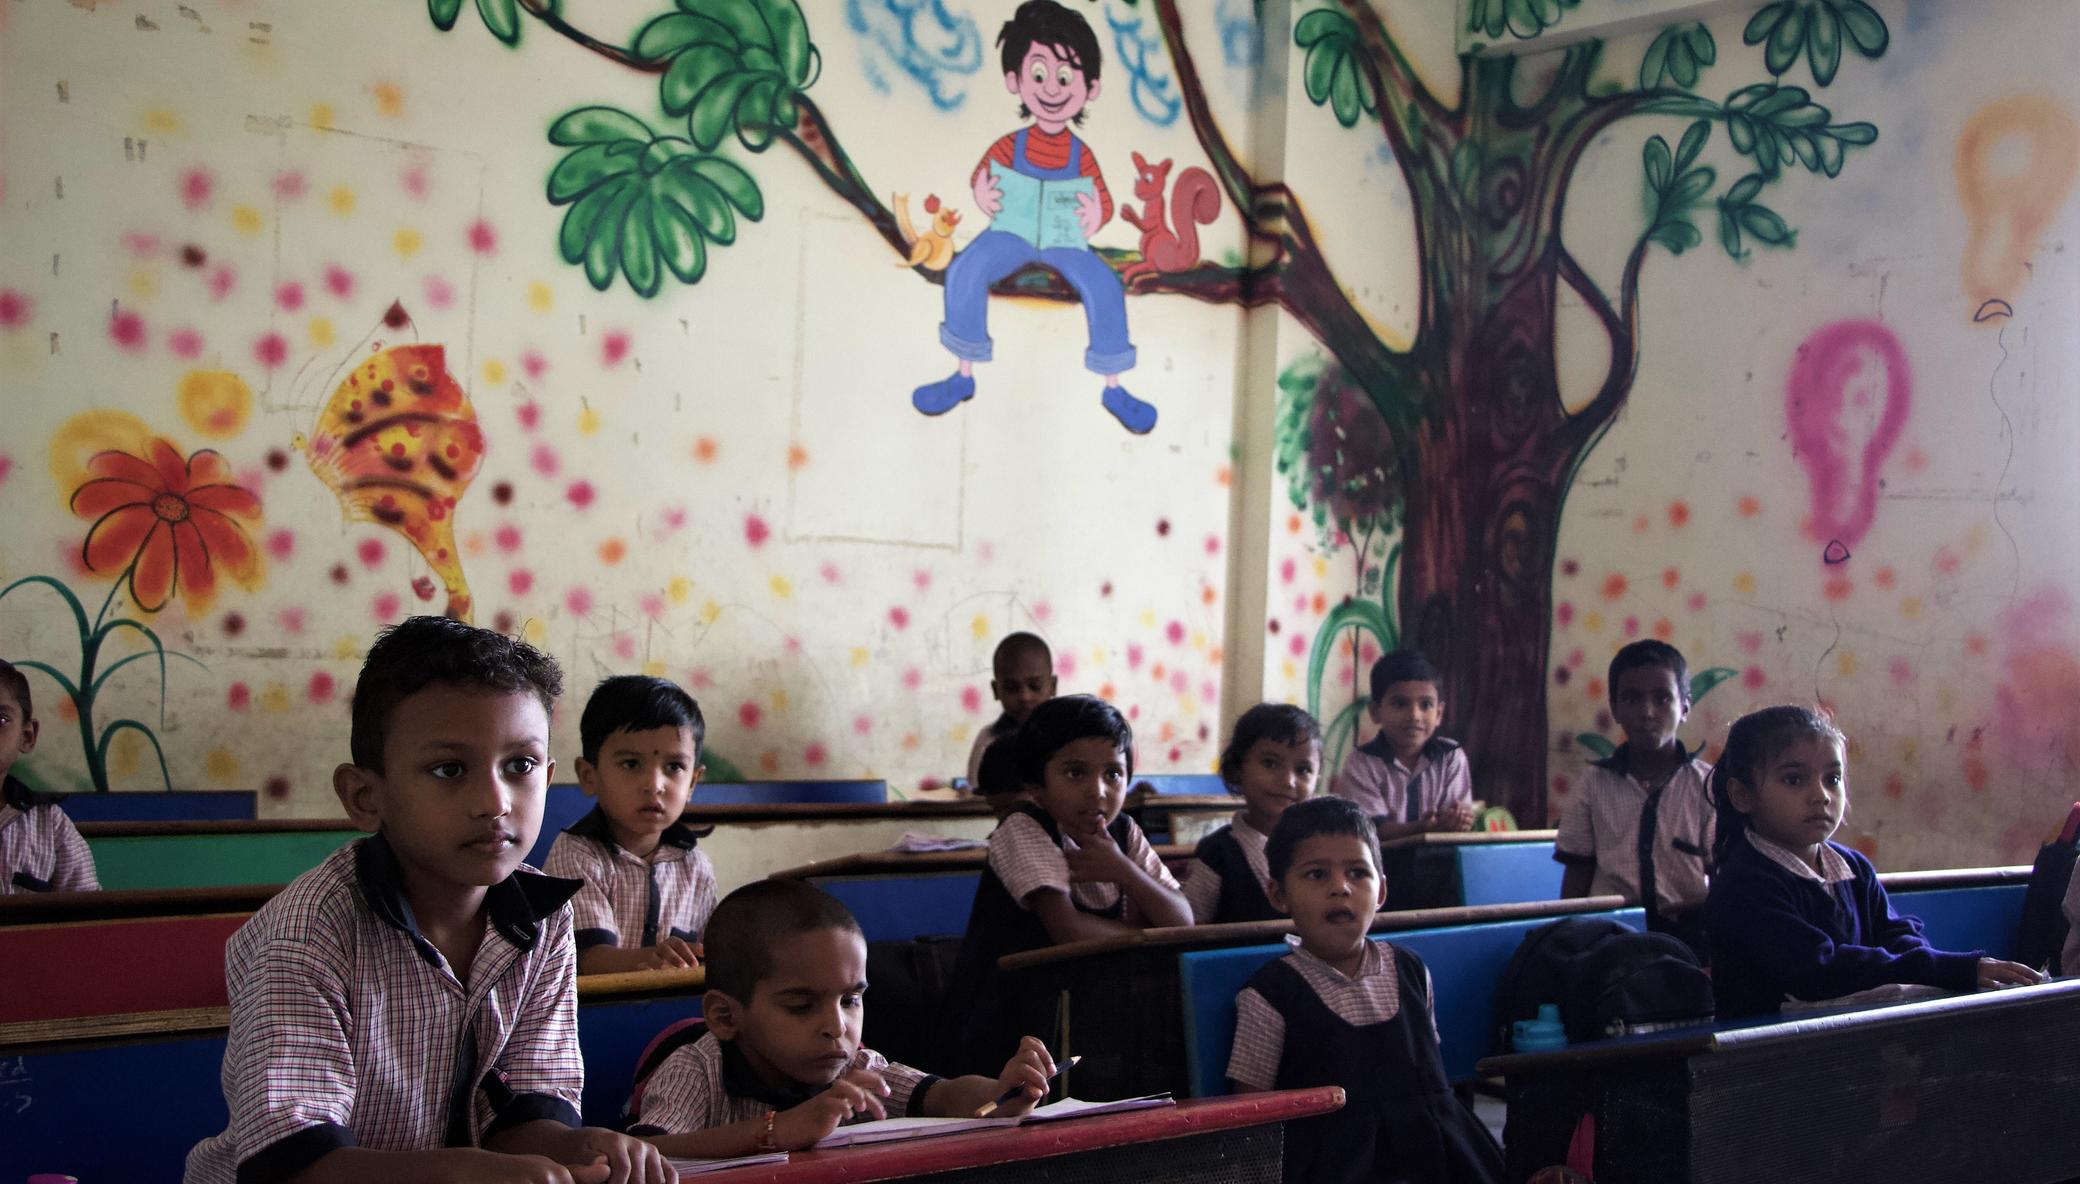 Educate street children in rural India